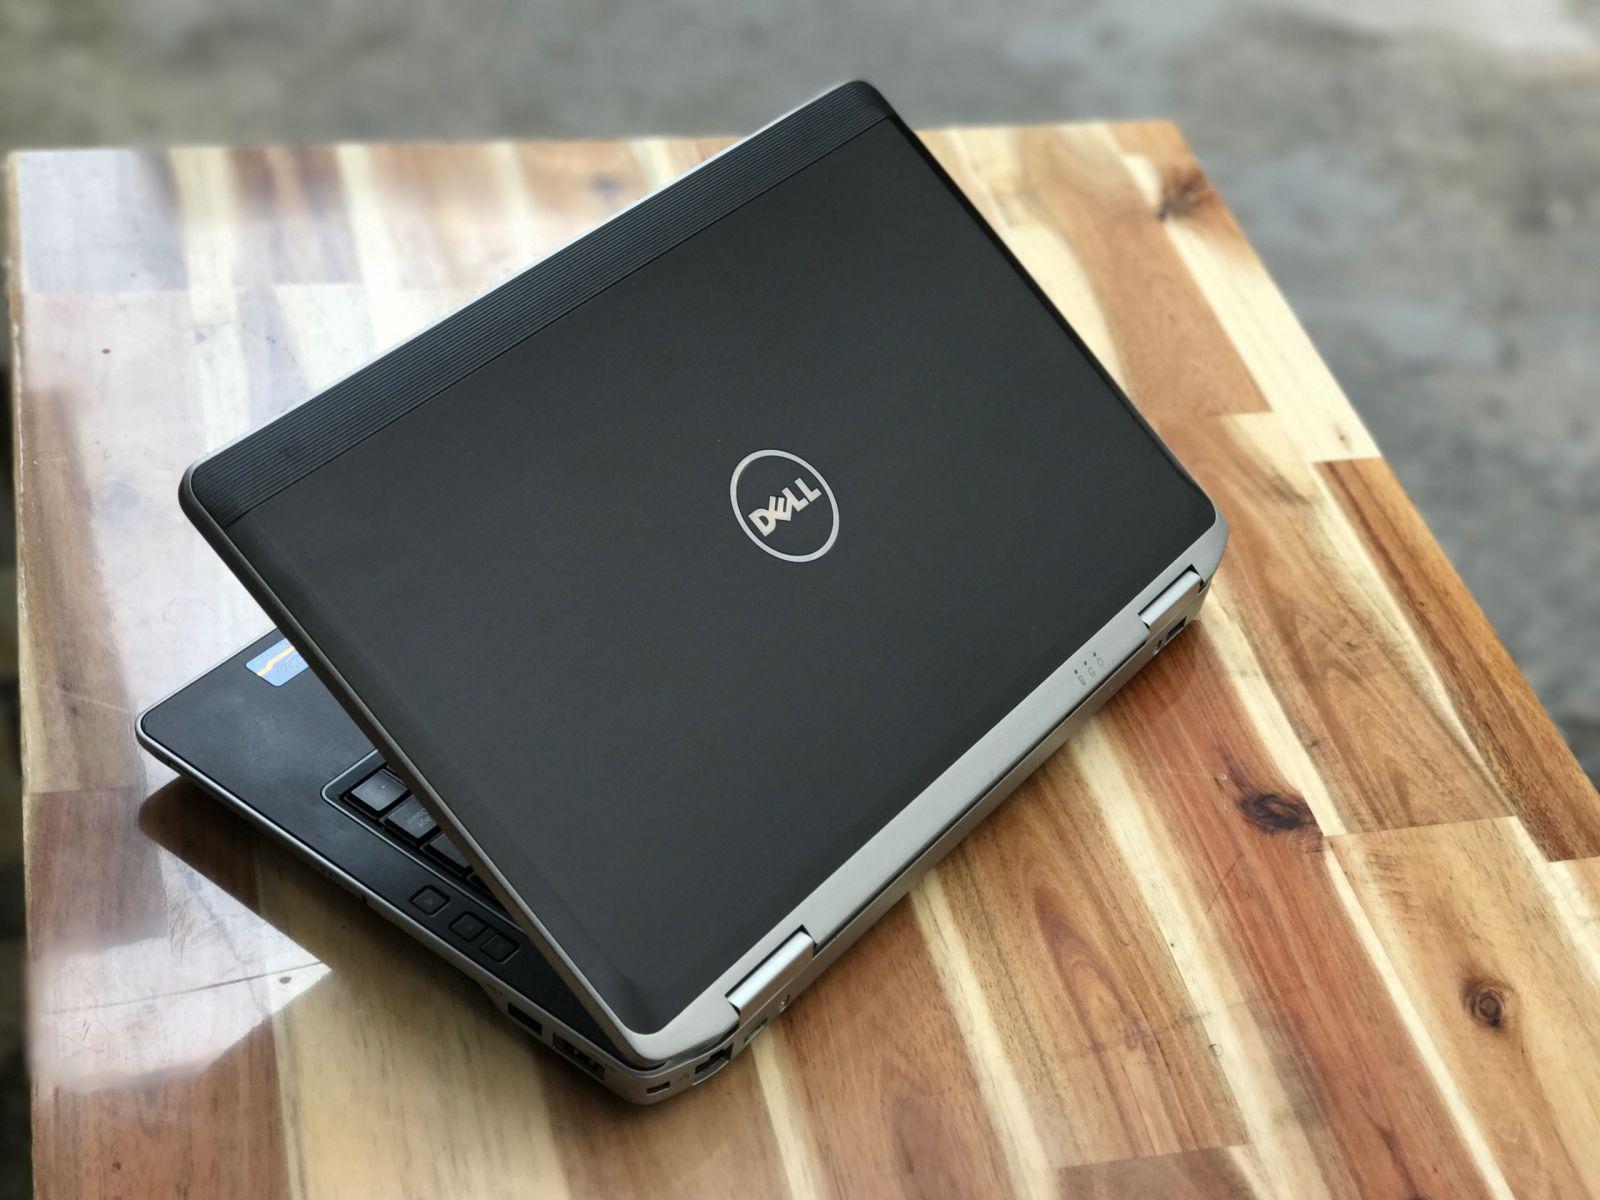 Dell latitude e6430s i5 giá rẻ